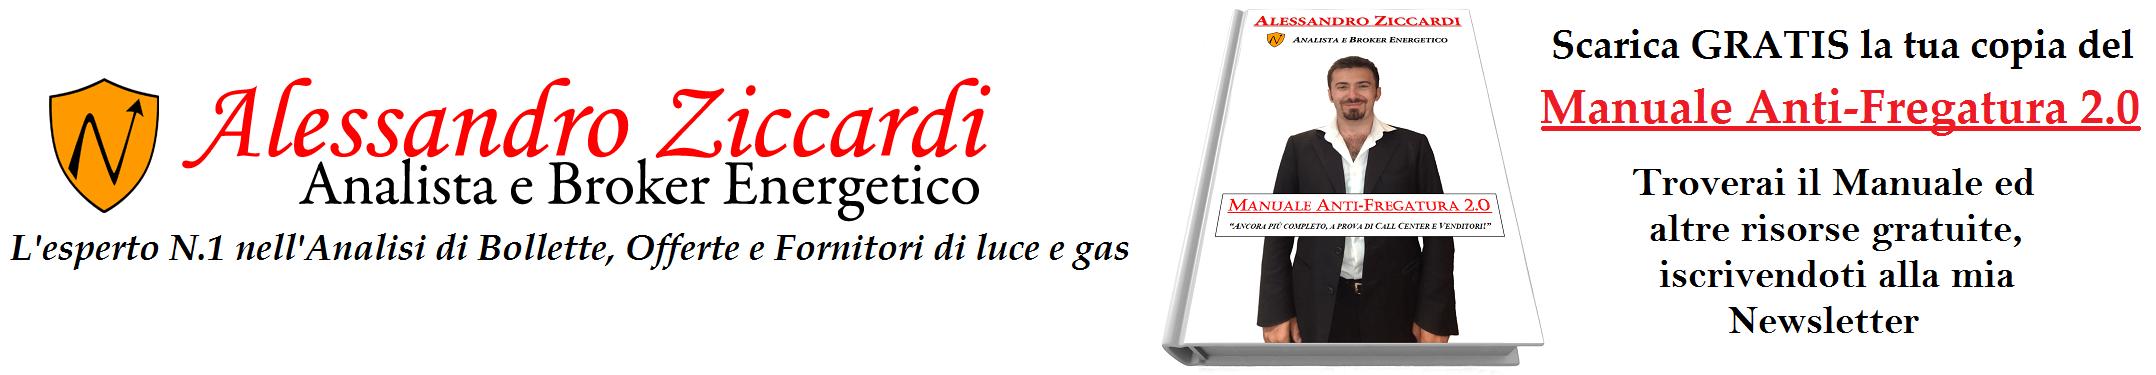 Alessandro Ziccardi Logo